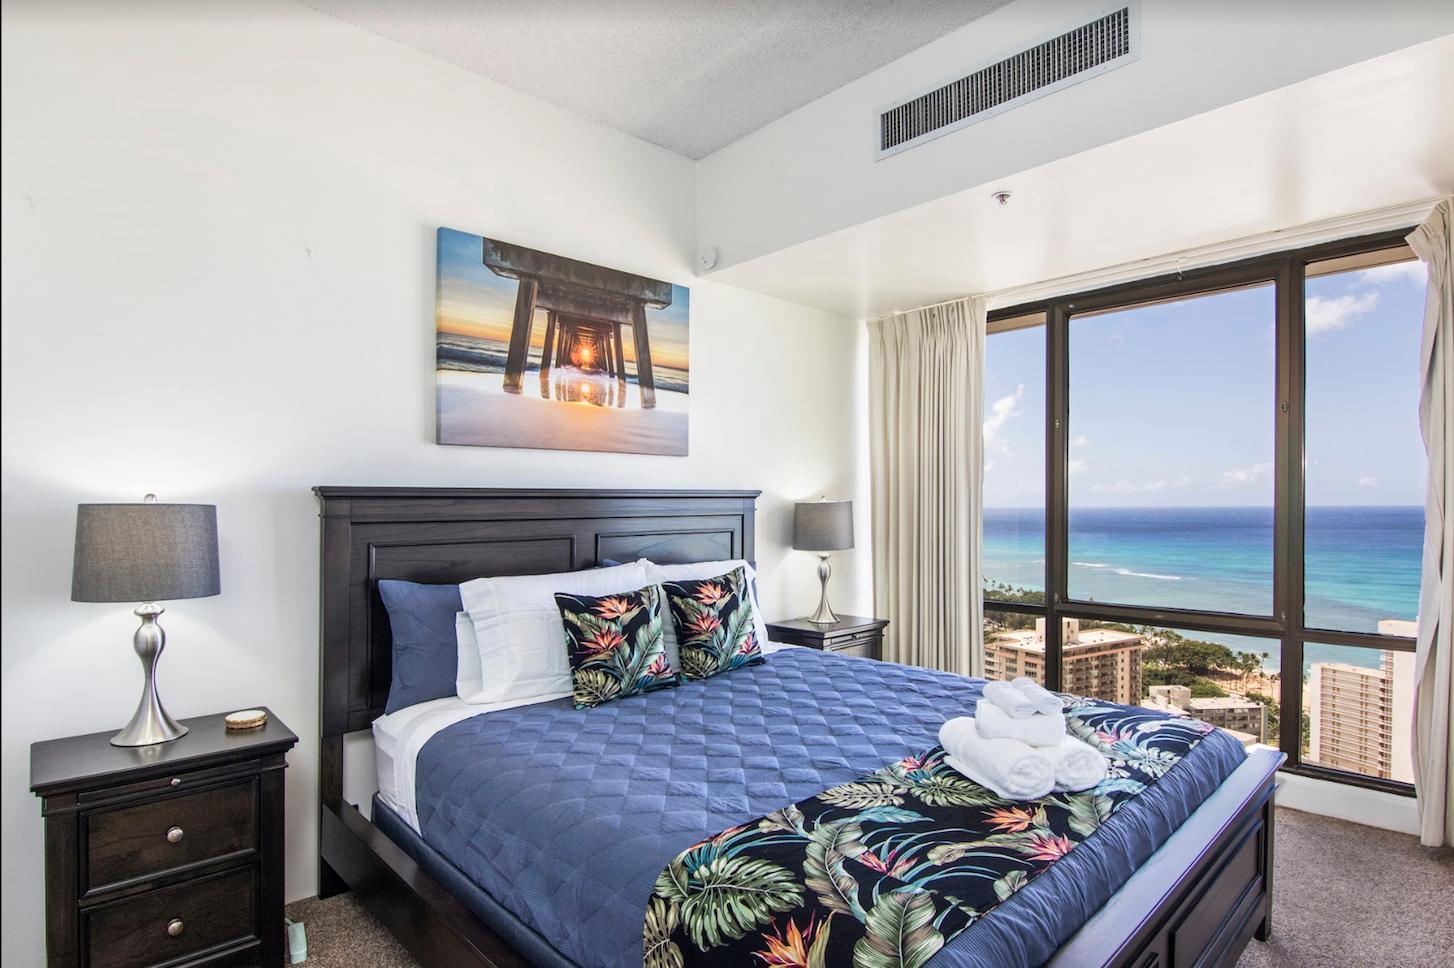 Brand new California King bed in Master bedroom